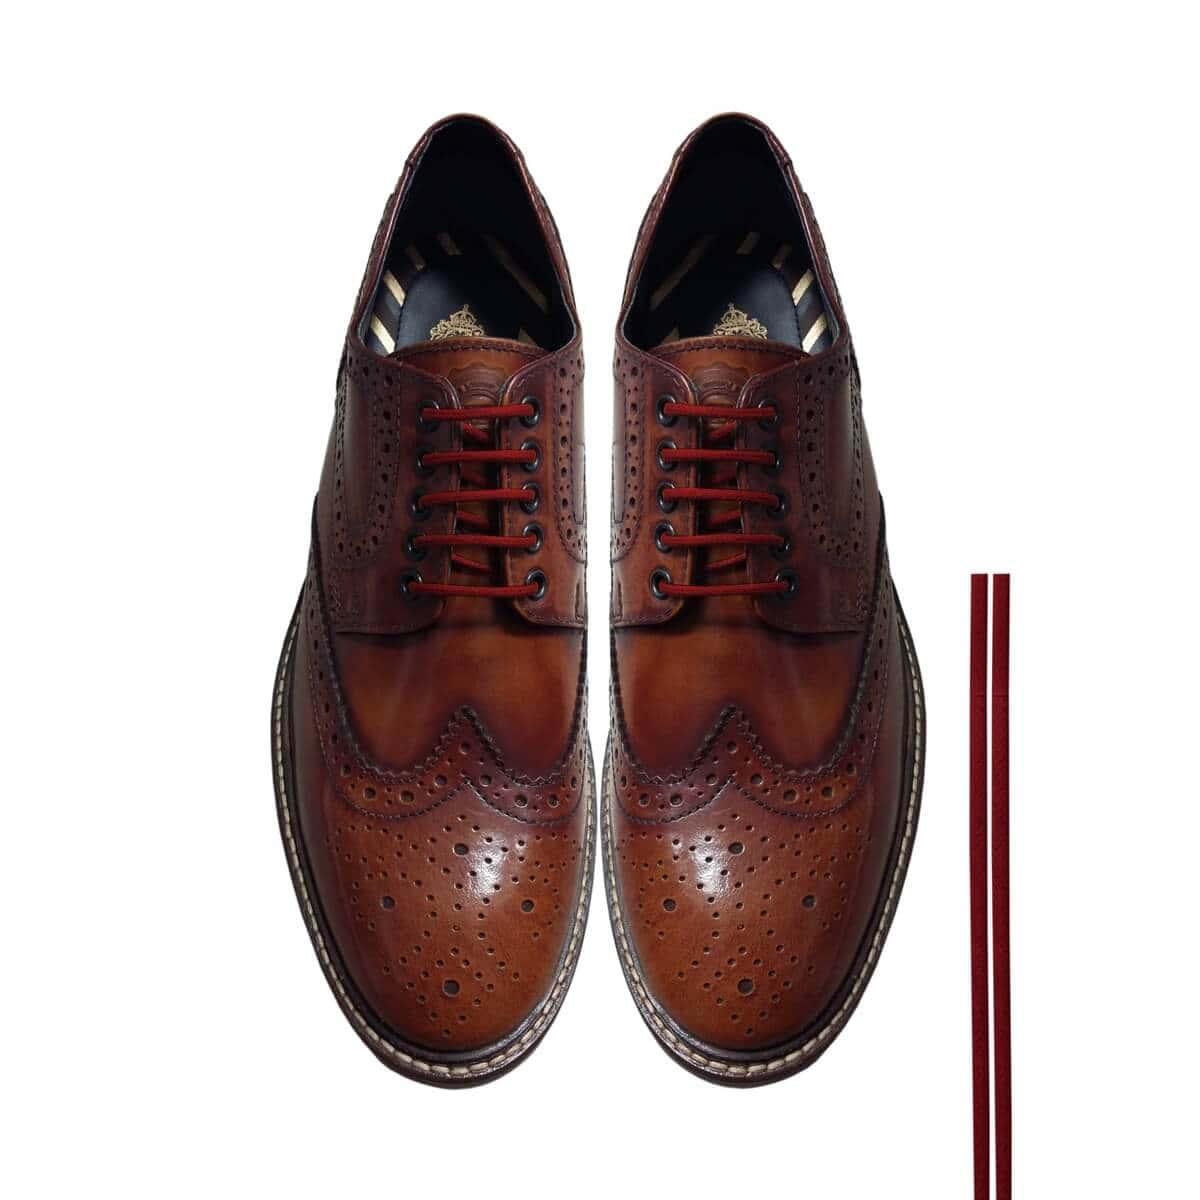 mejor servicio b5e43 4d513 Cordones Zapatos Granate Redondos Finos